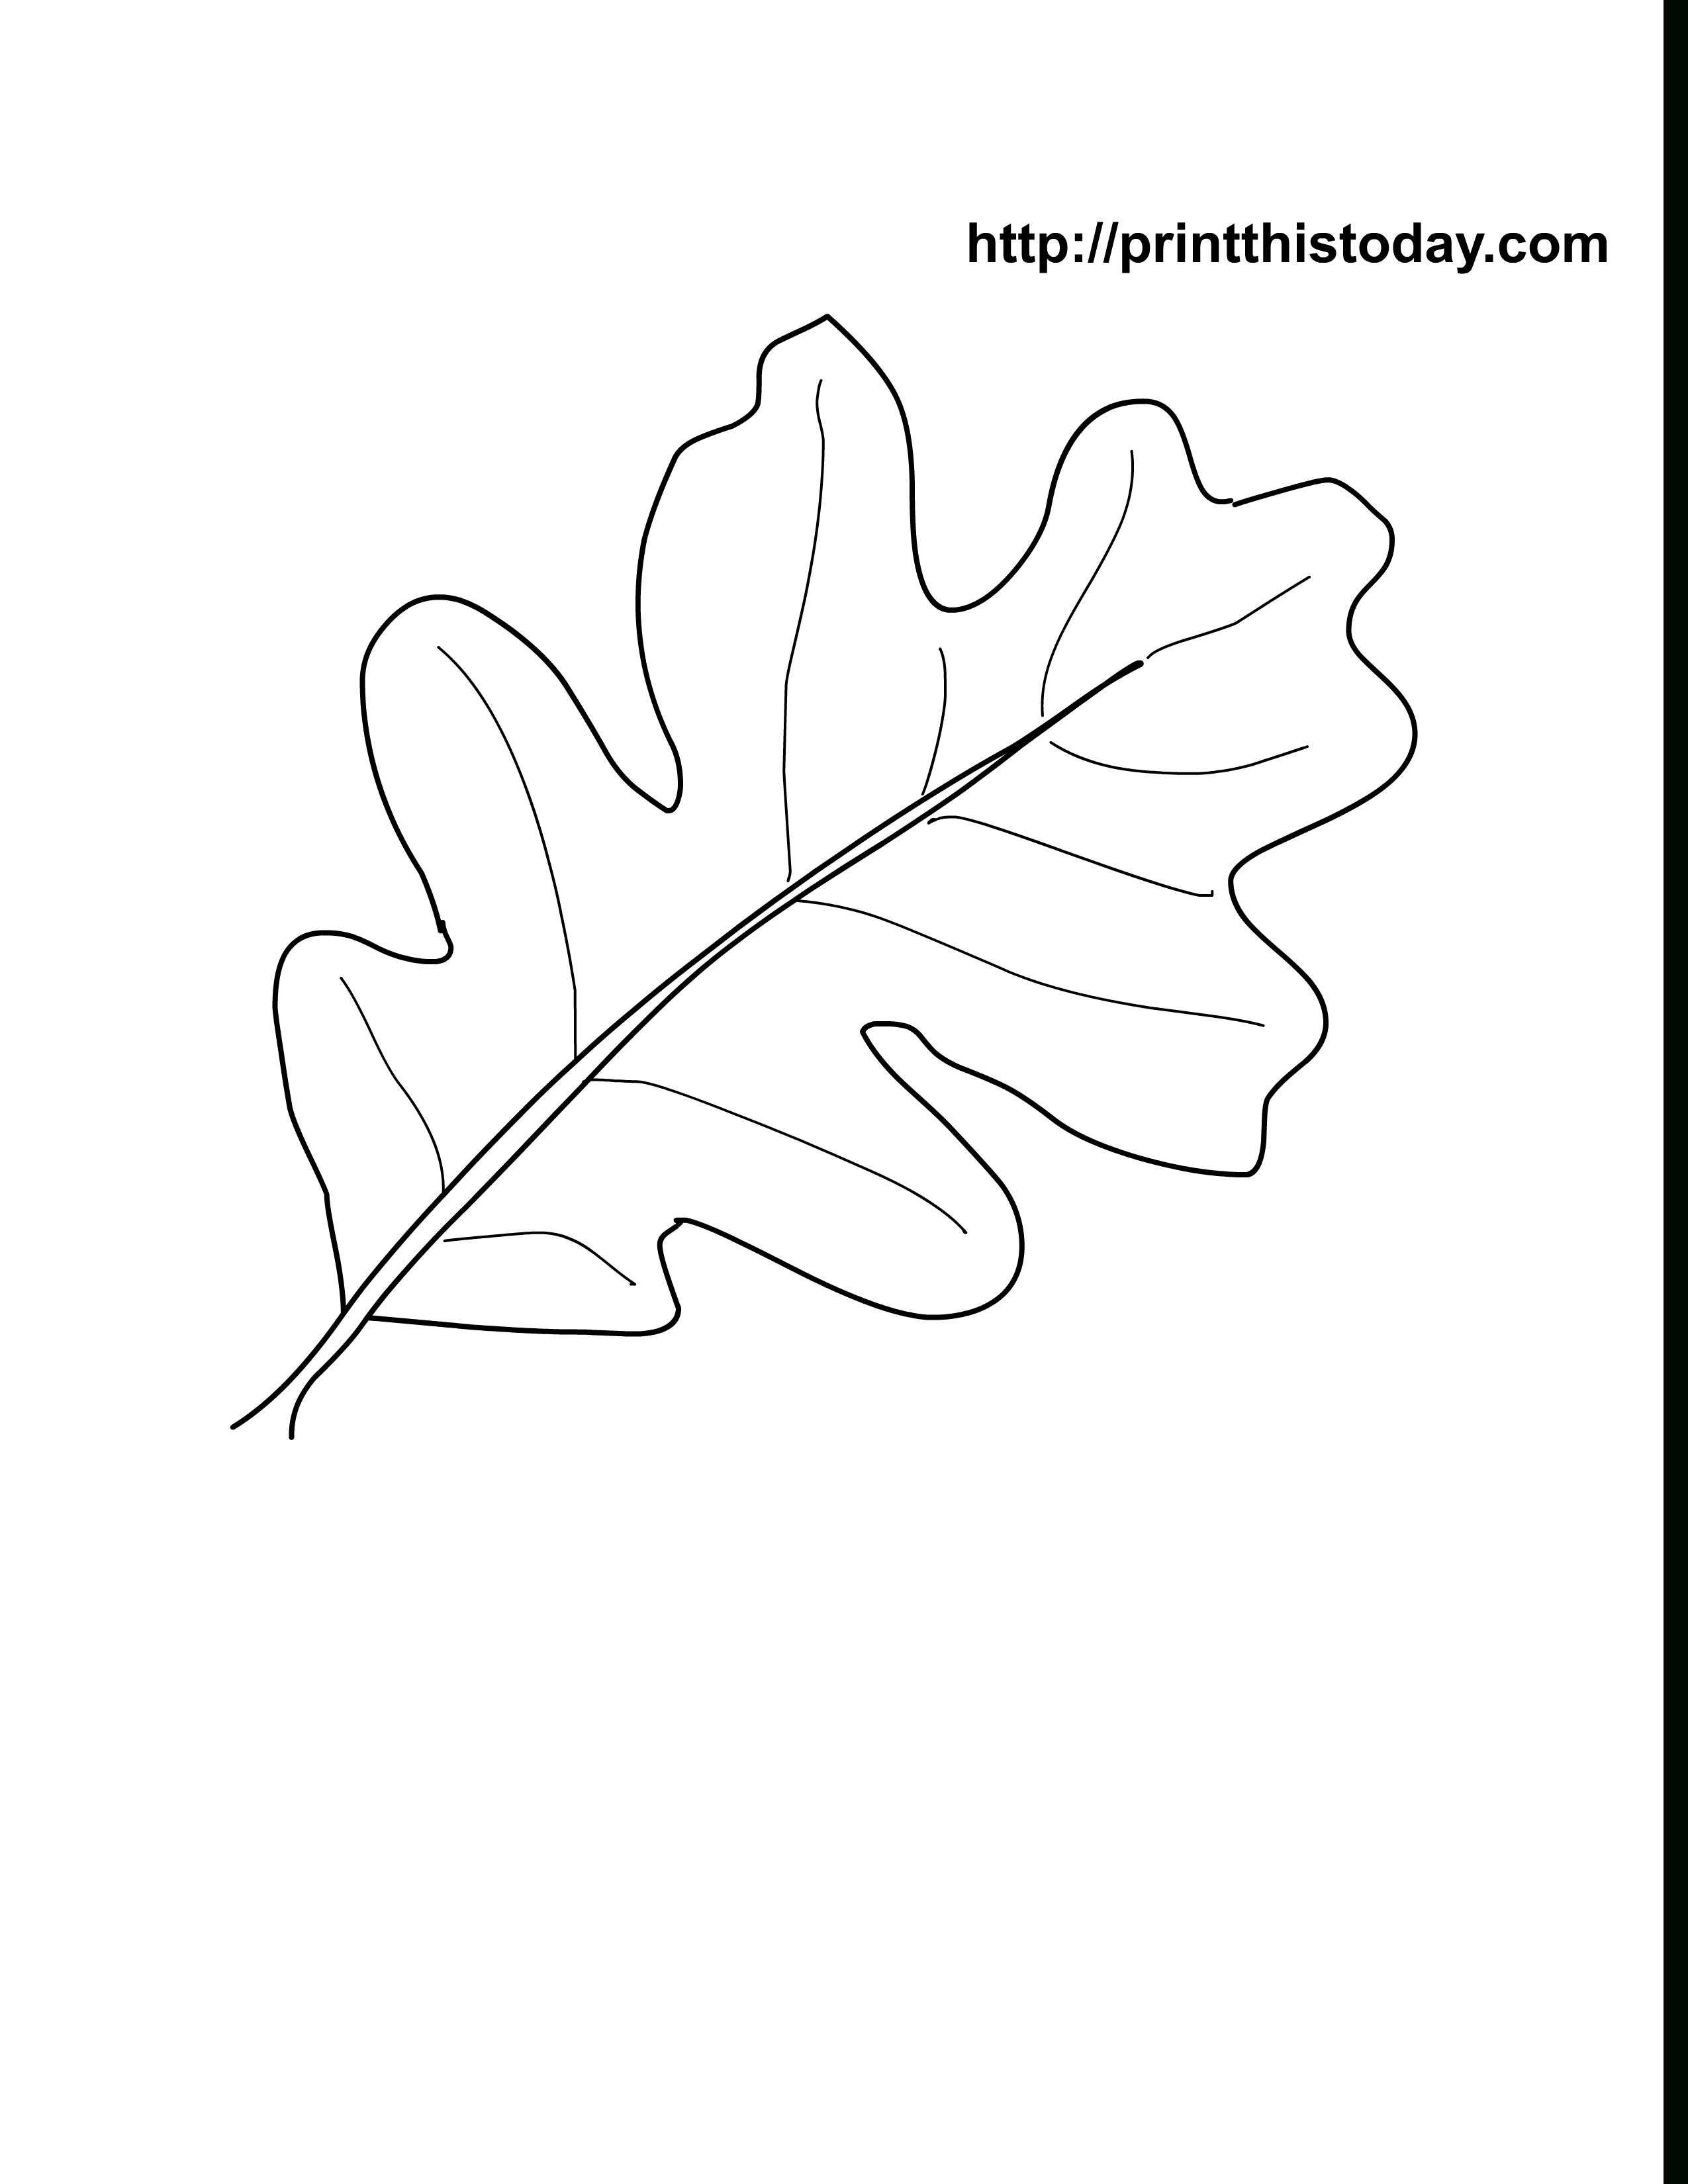 Oak Leaves Coloring Pages Printable   Craft Ideas   Leaf Coloring - Free Printable Leaf Template